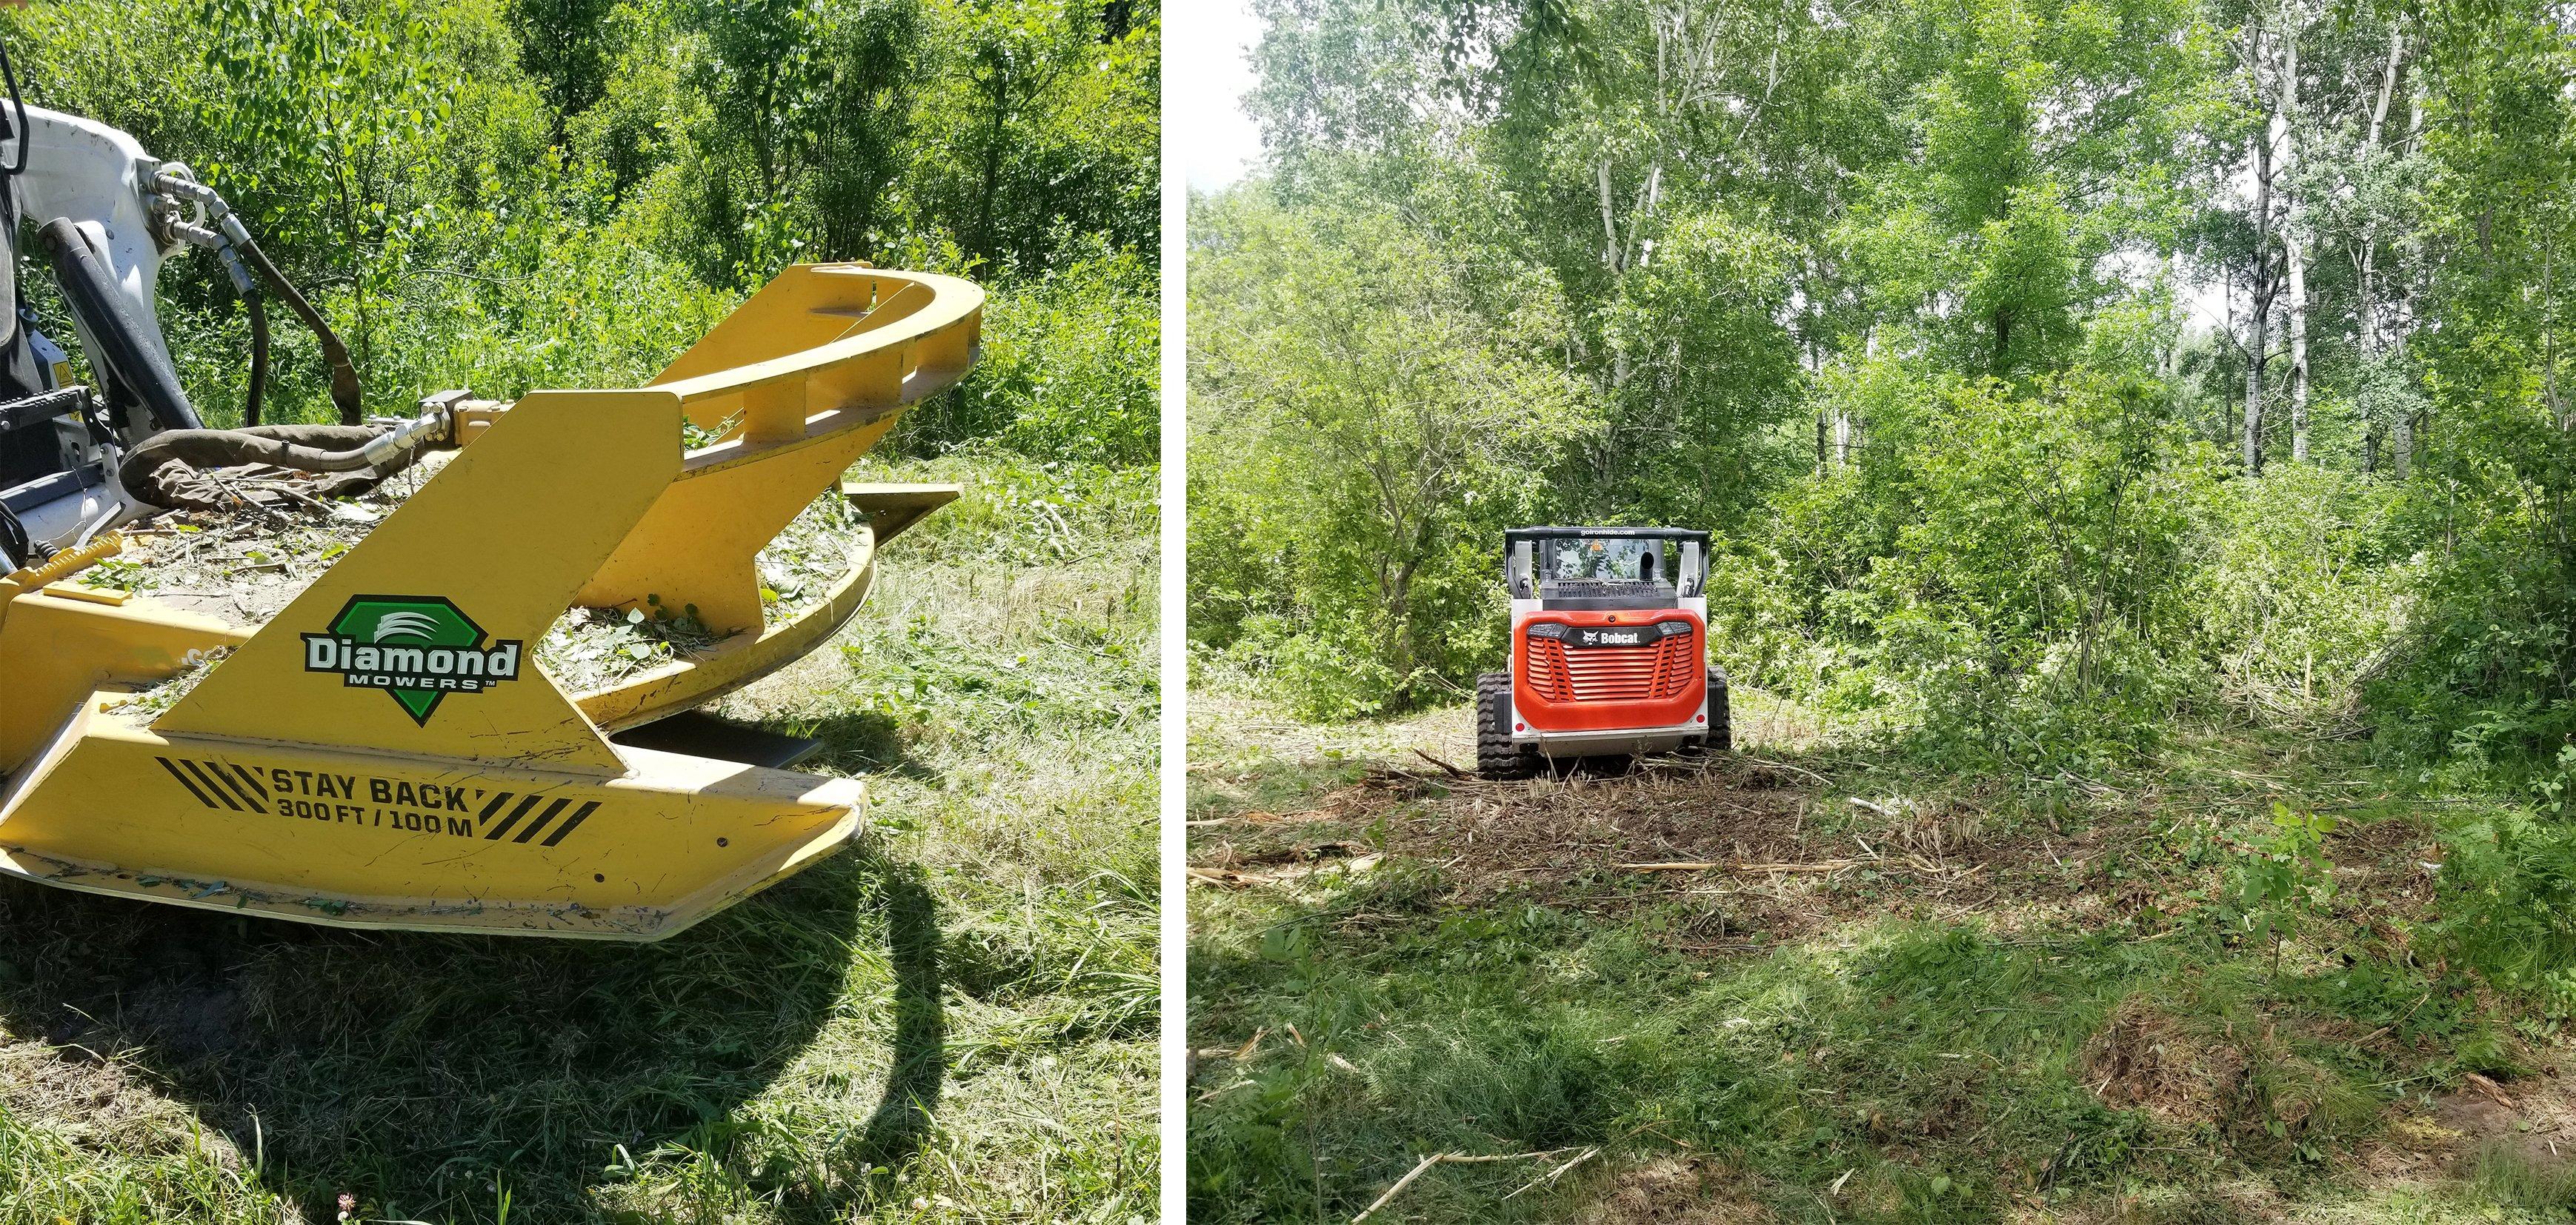 Trail Blazers - Rotary Mower